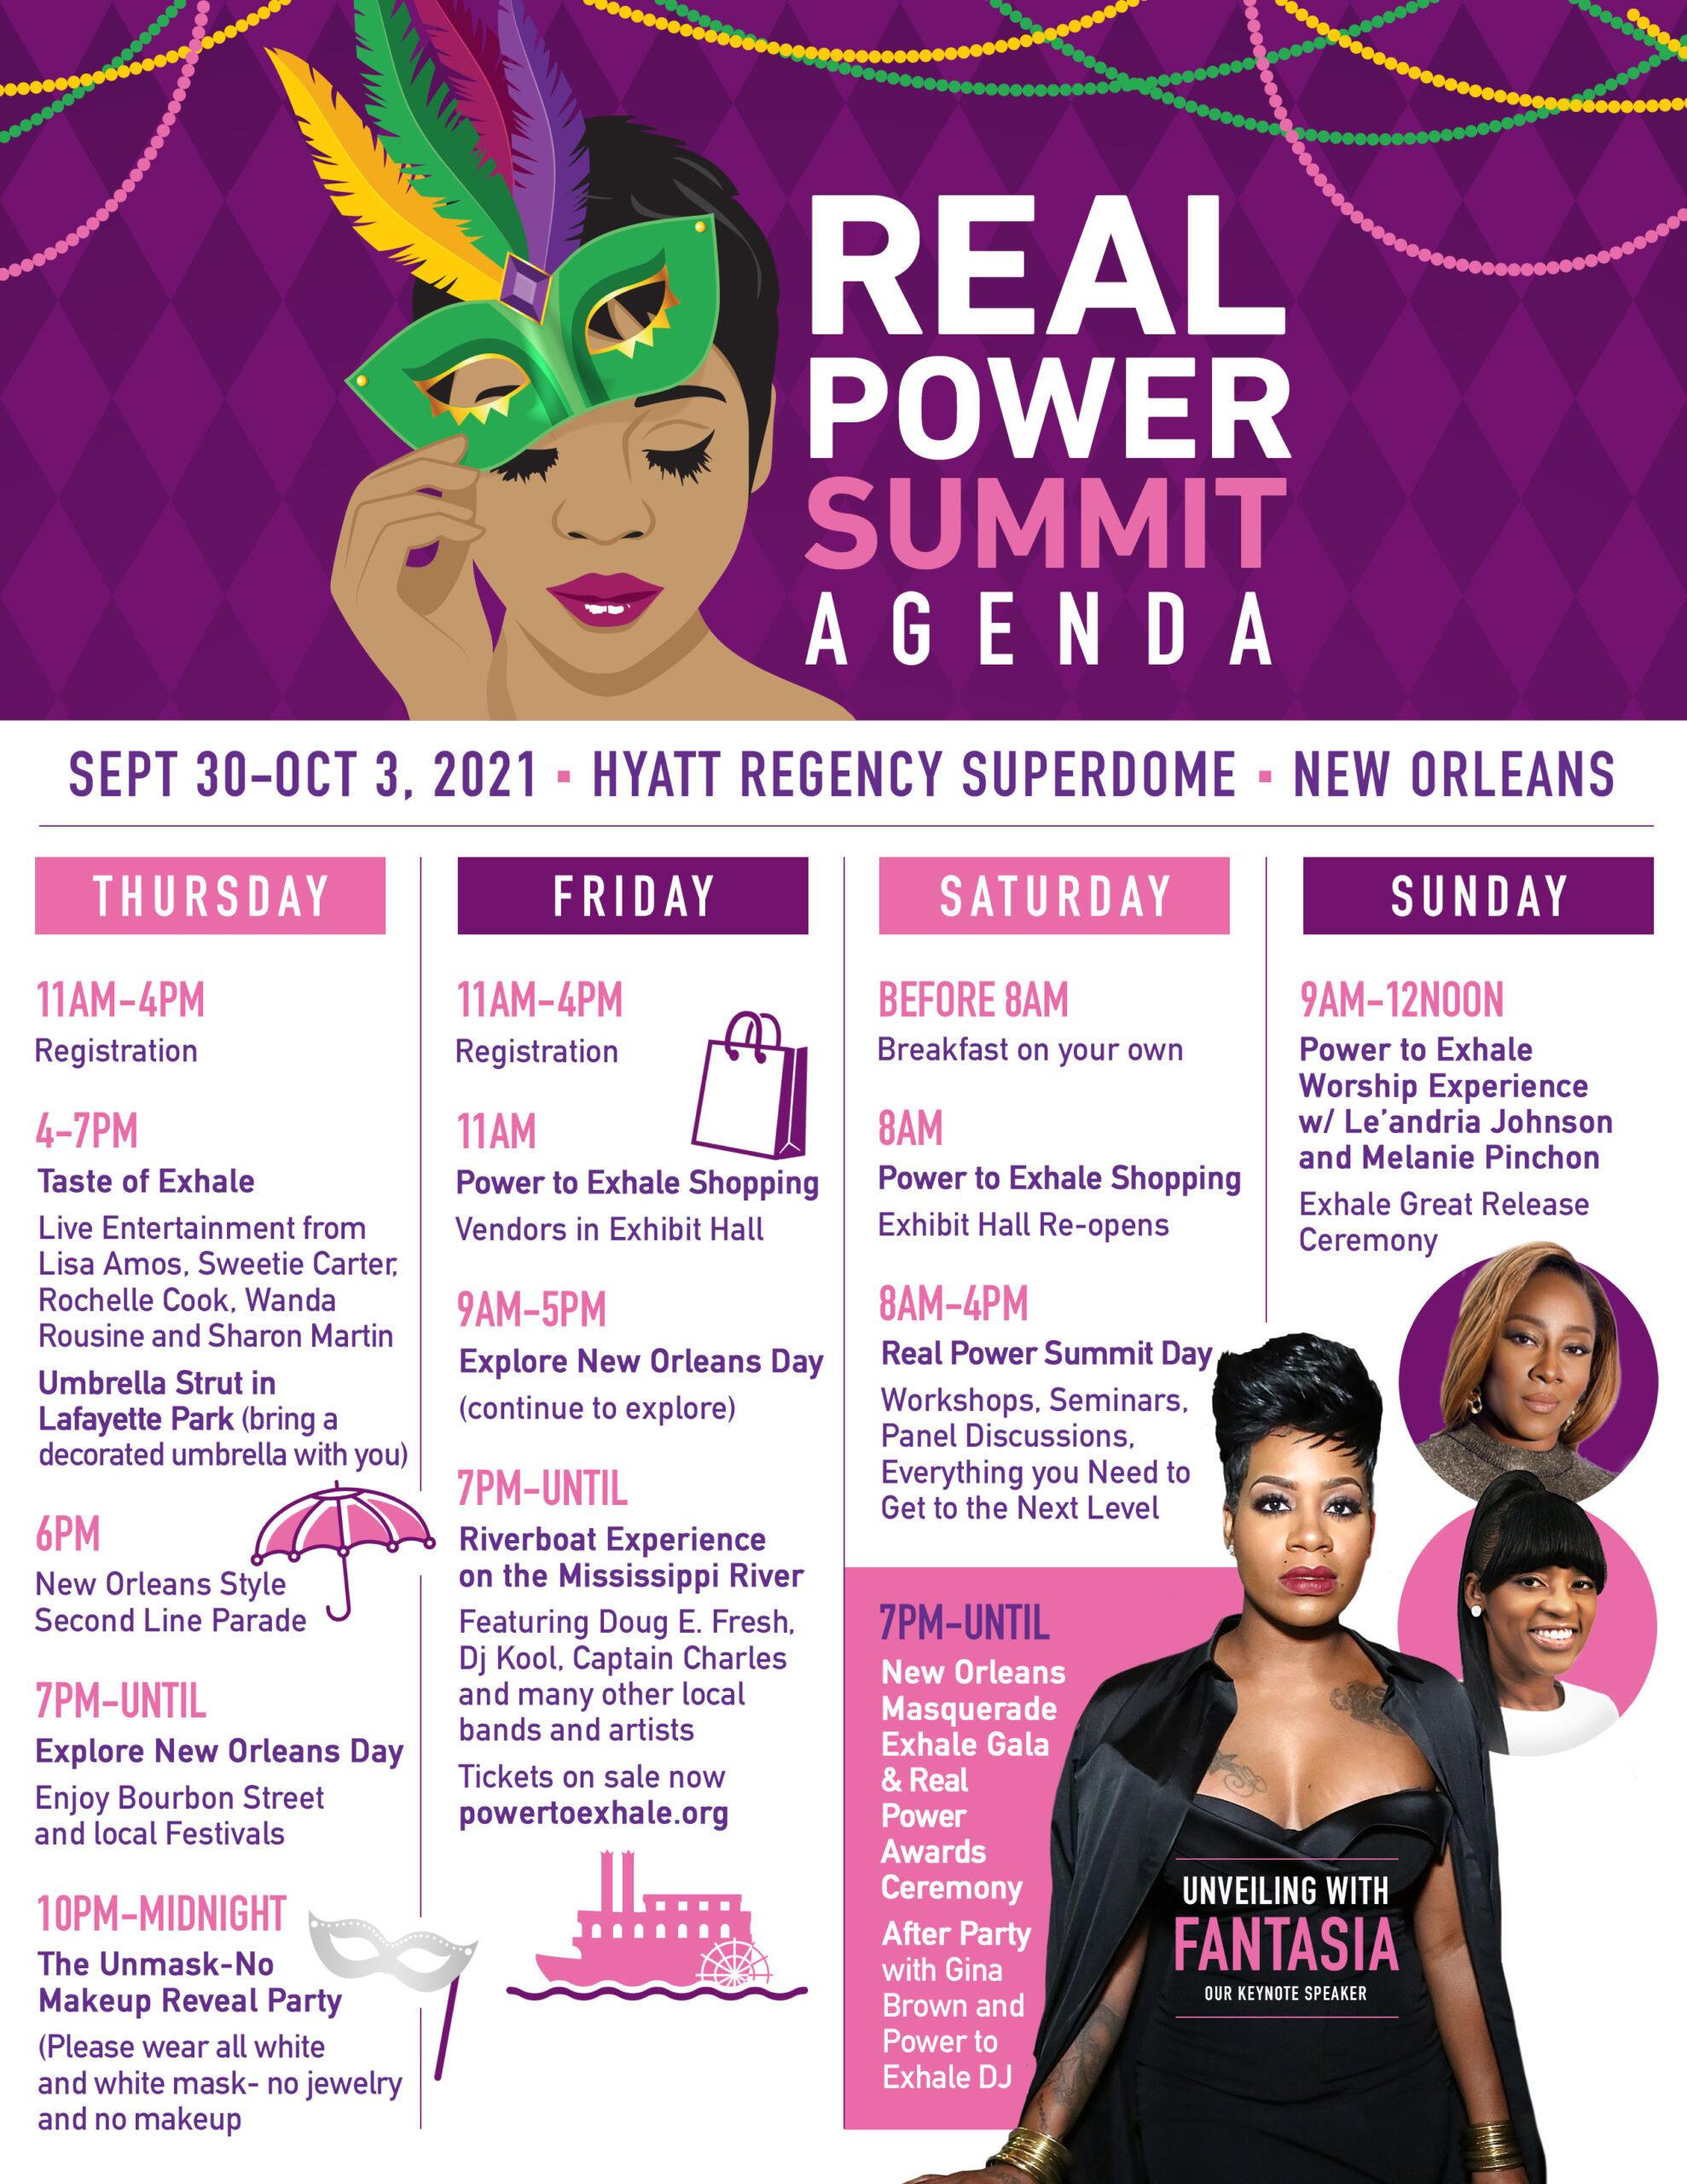 Flyer_Real Power Summit_2020_Agenda_v2